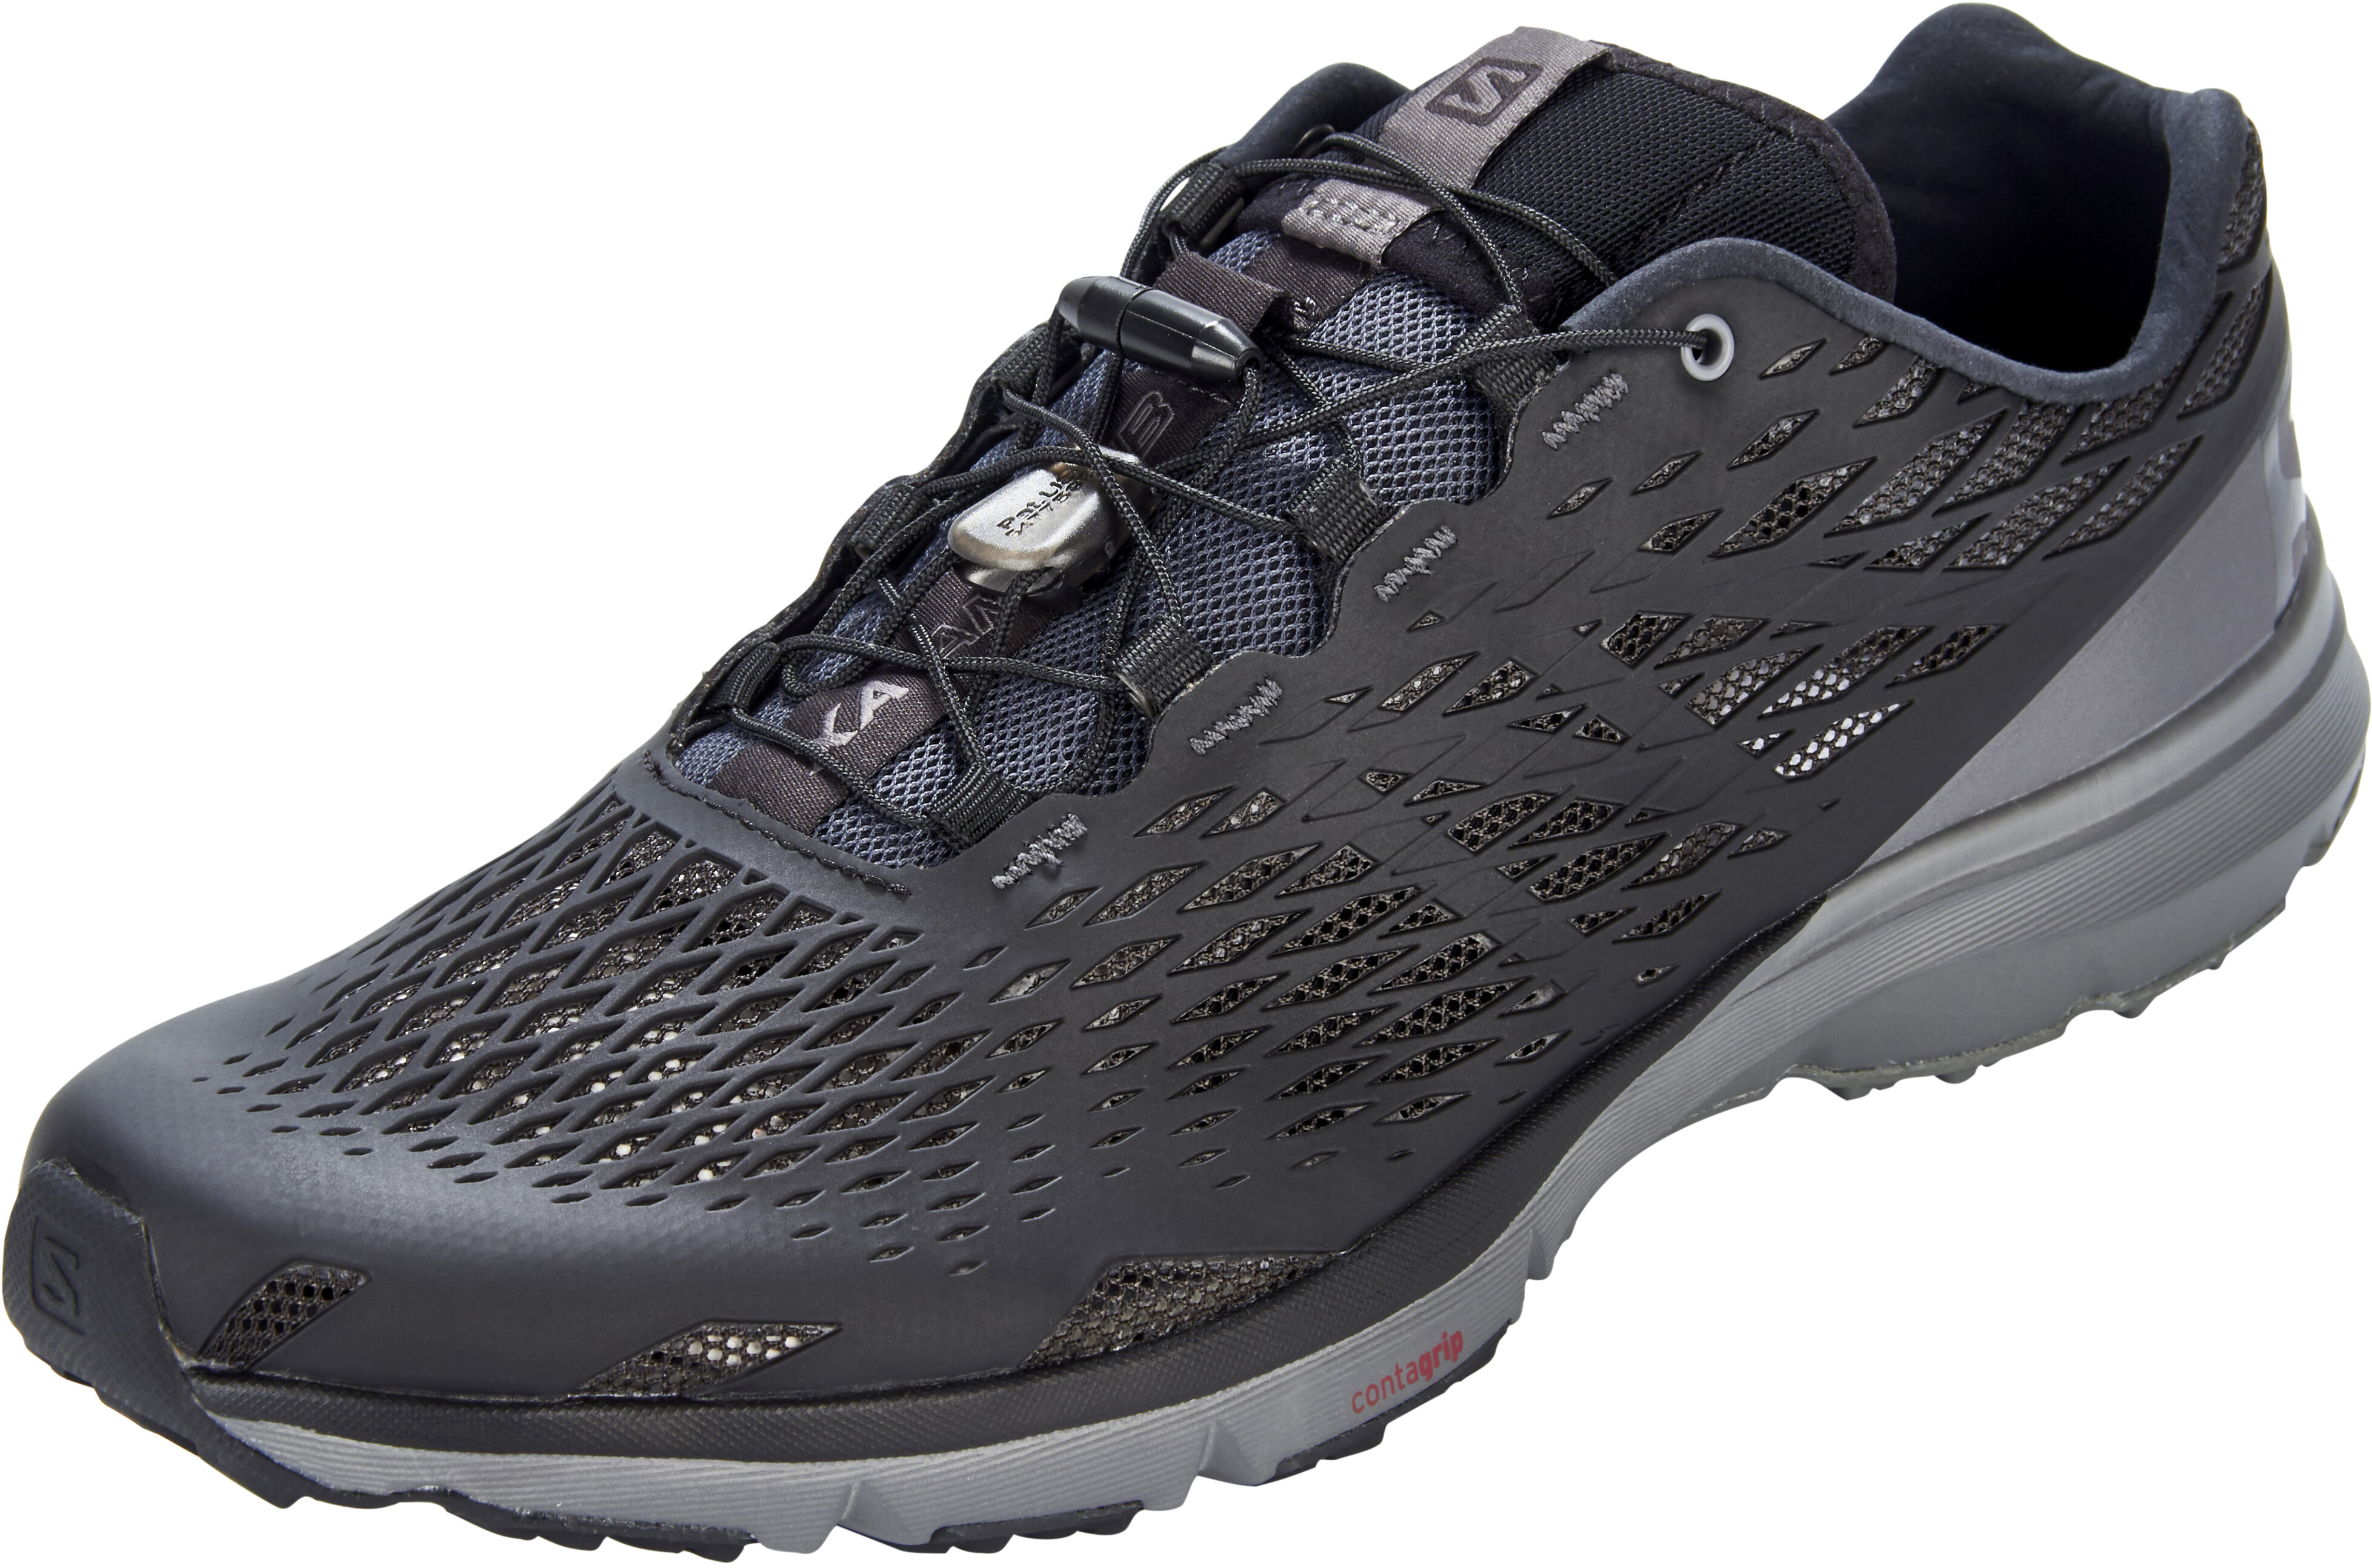 dfd786ef33c3 Salomon XA Amphib Shoes Men black at Addnature.co.uk